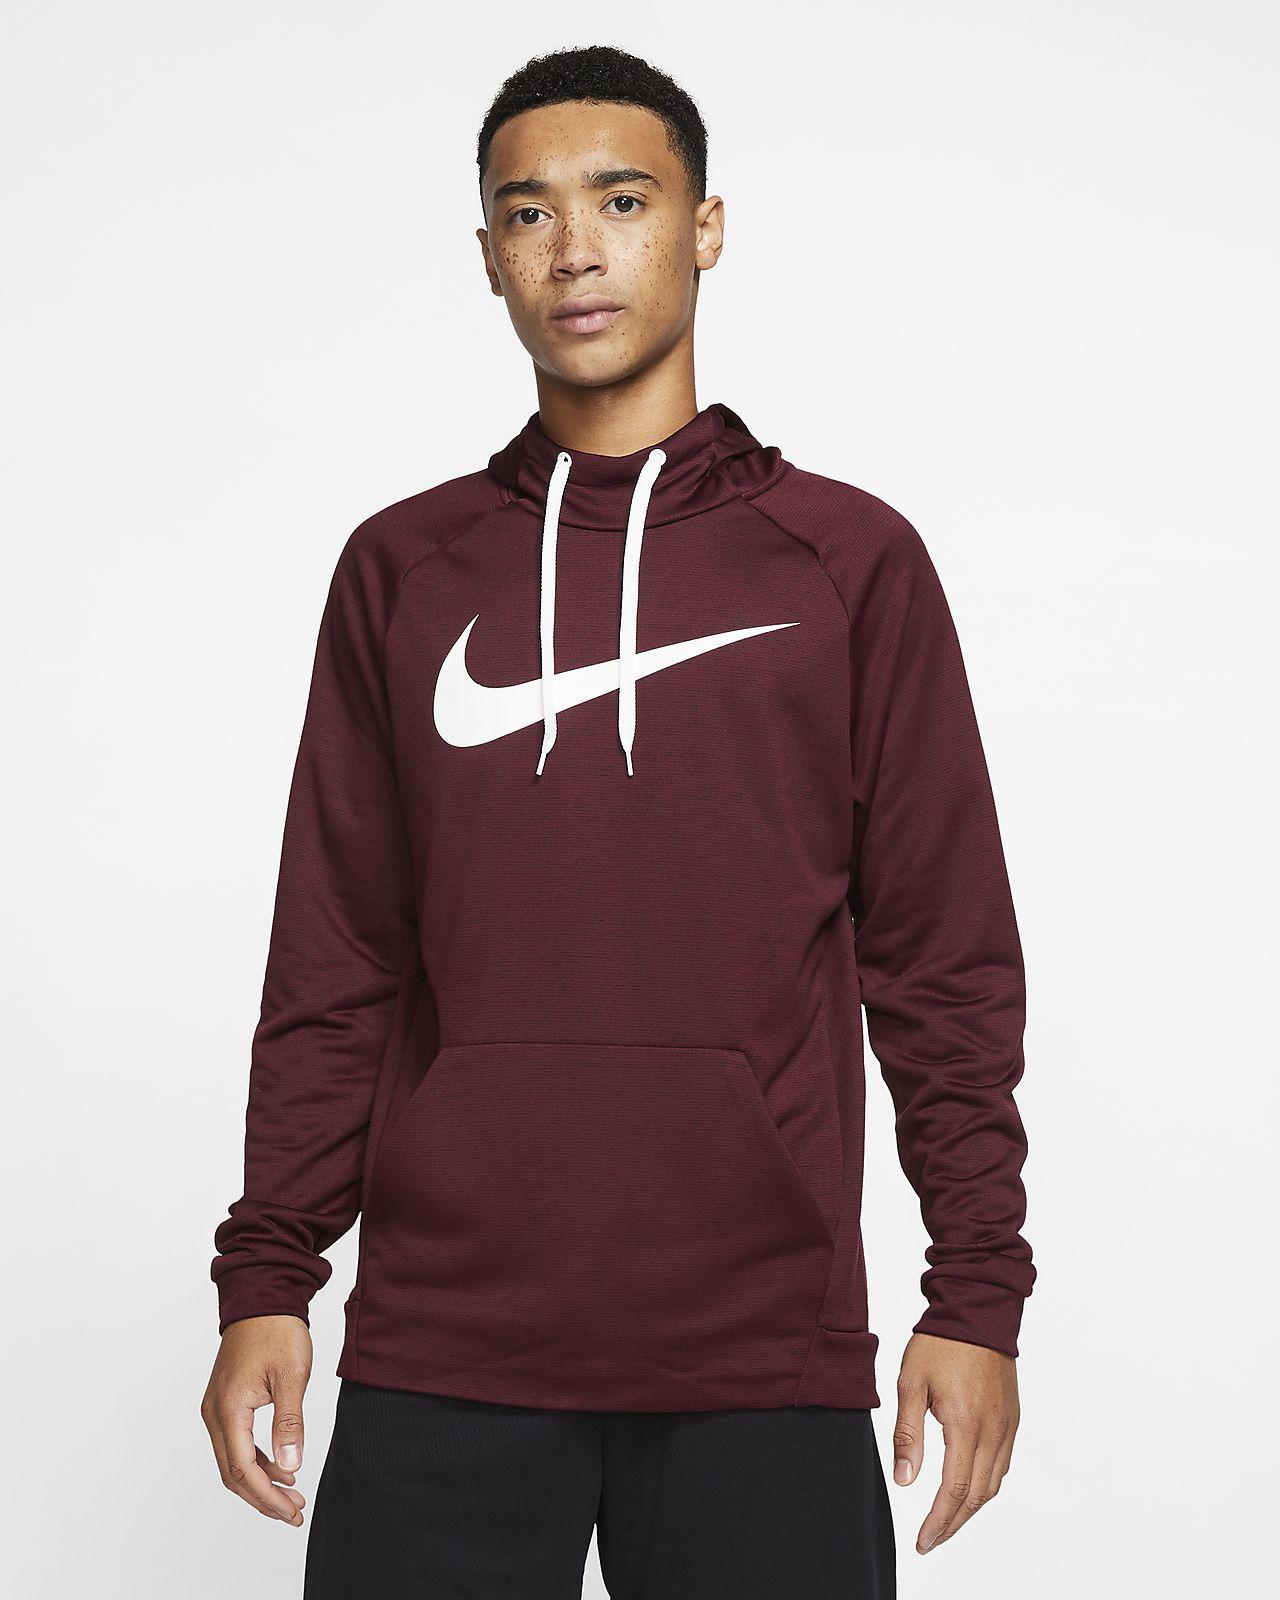 Nike Dri FIT Men's Training Hoodie